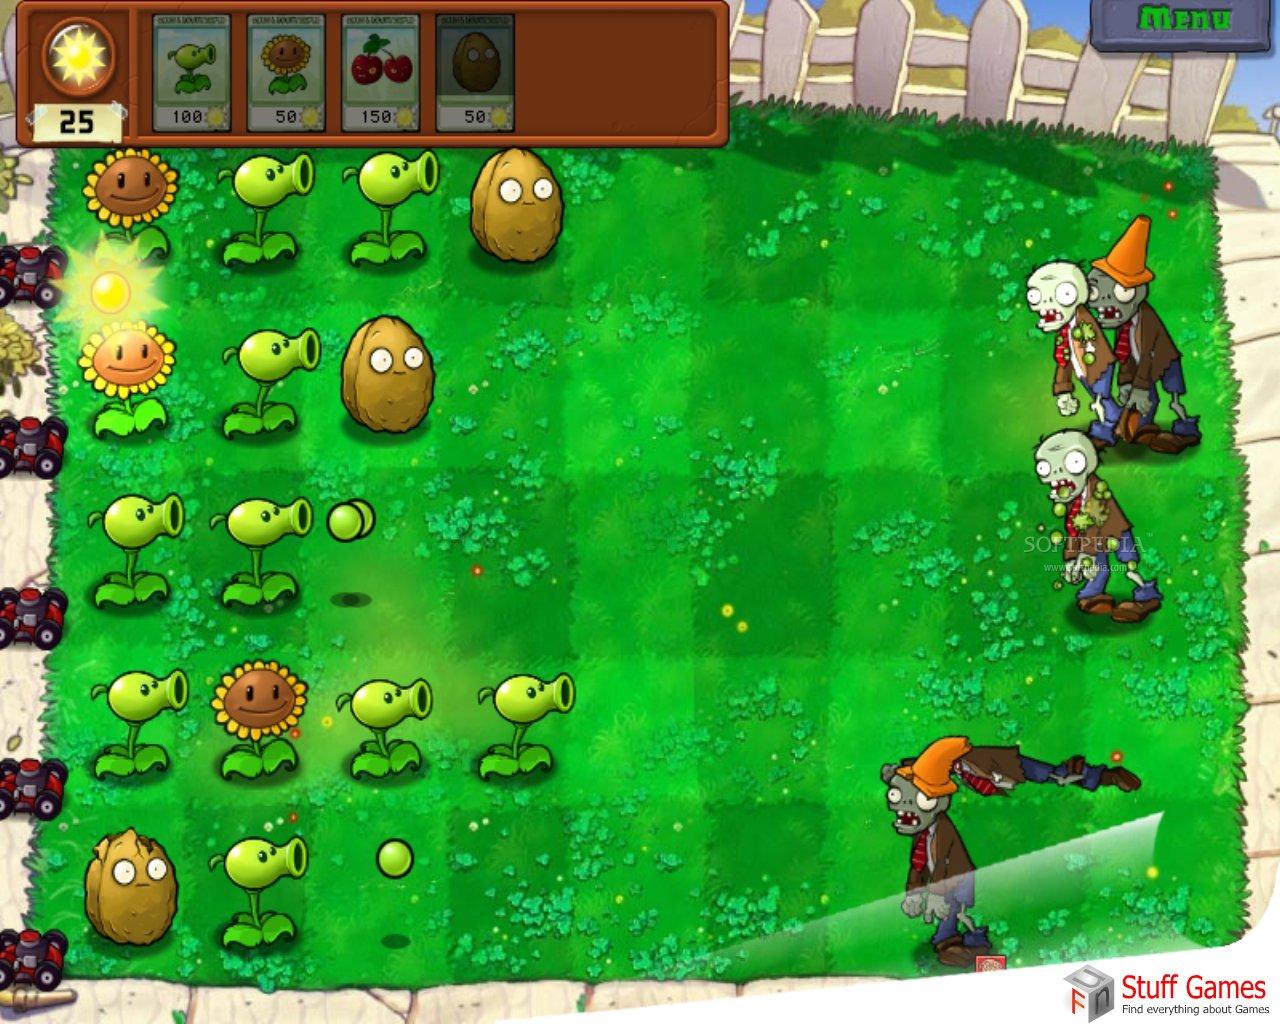 Free Download Plant vs Zombie 2 for PC Komputer Full ...